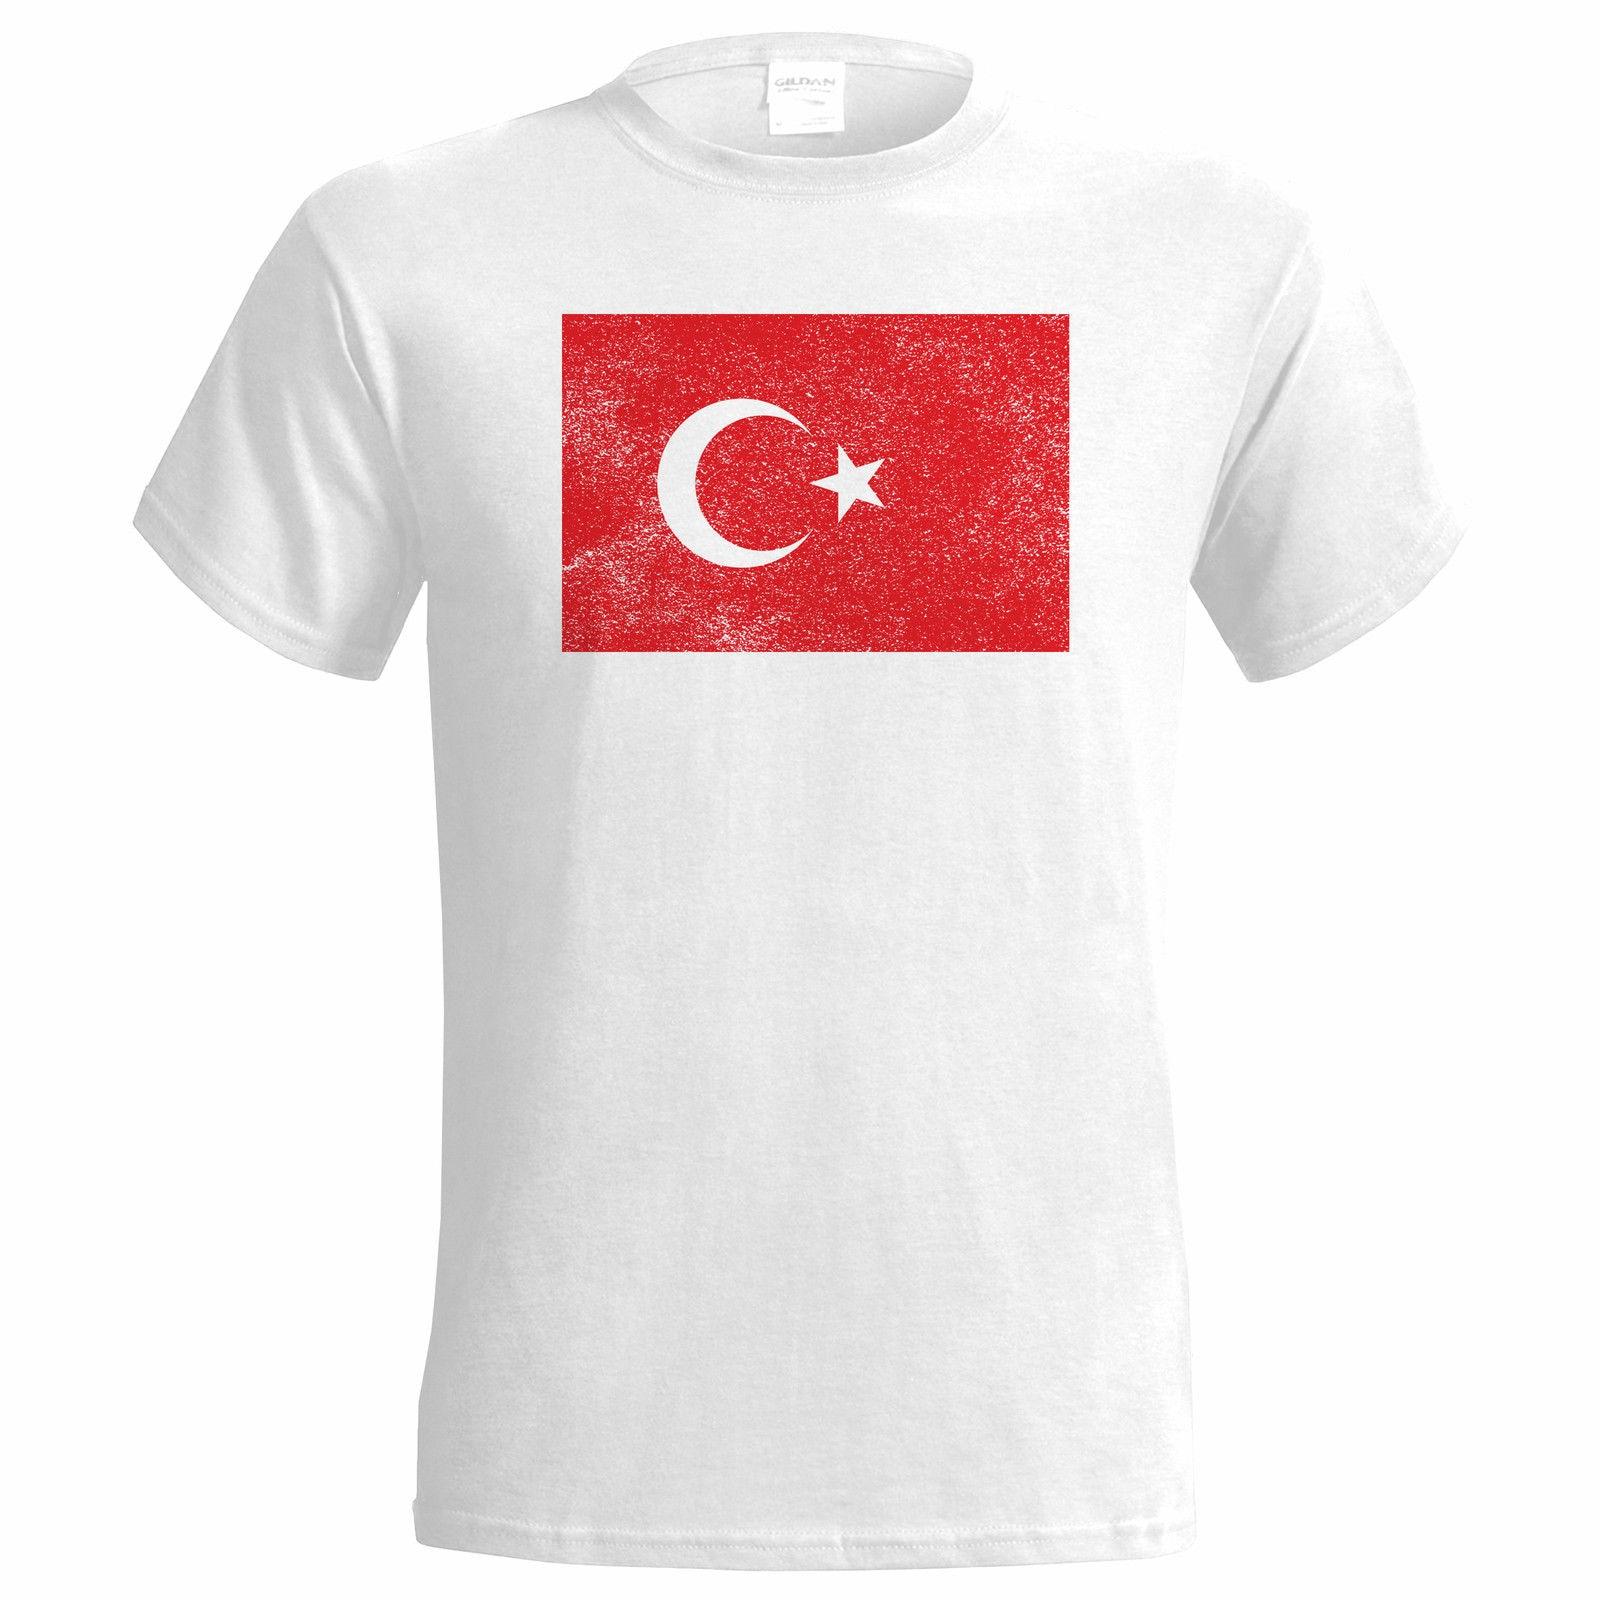 TURKEY DISTRESSED LOOK FLAG MENS T SHIRT  SPORTER NATIONAL Top Tee 100% Cotton Humor Men Crewneck Shirts Basic Models